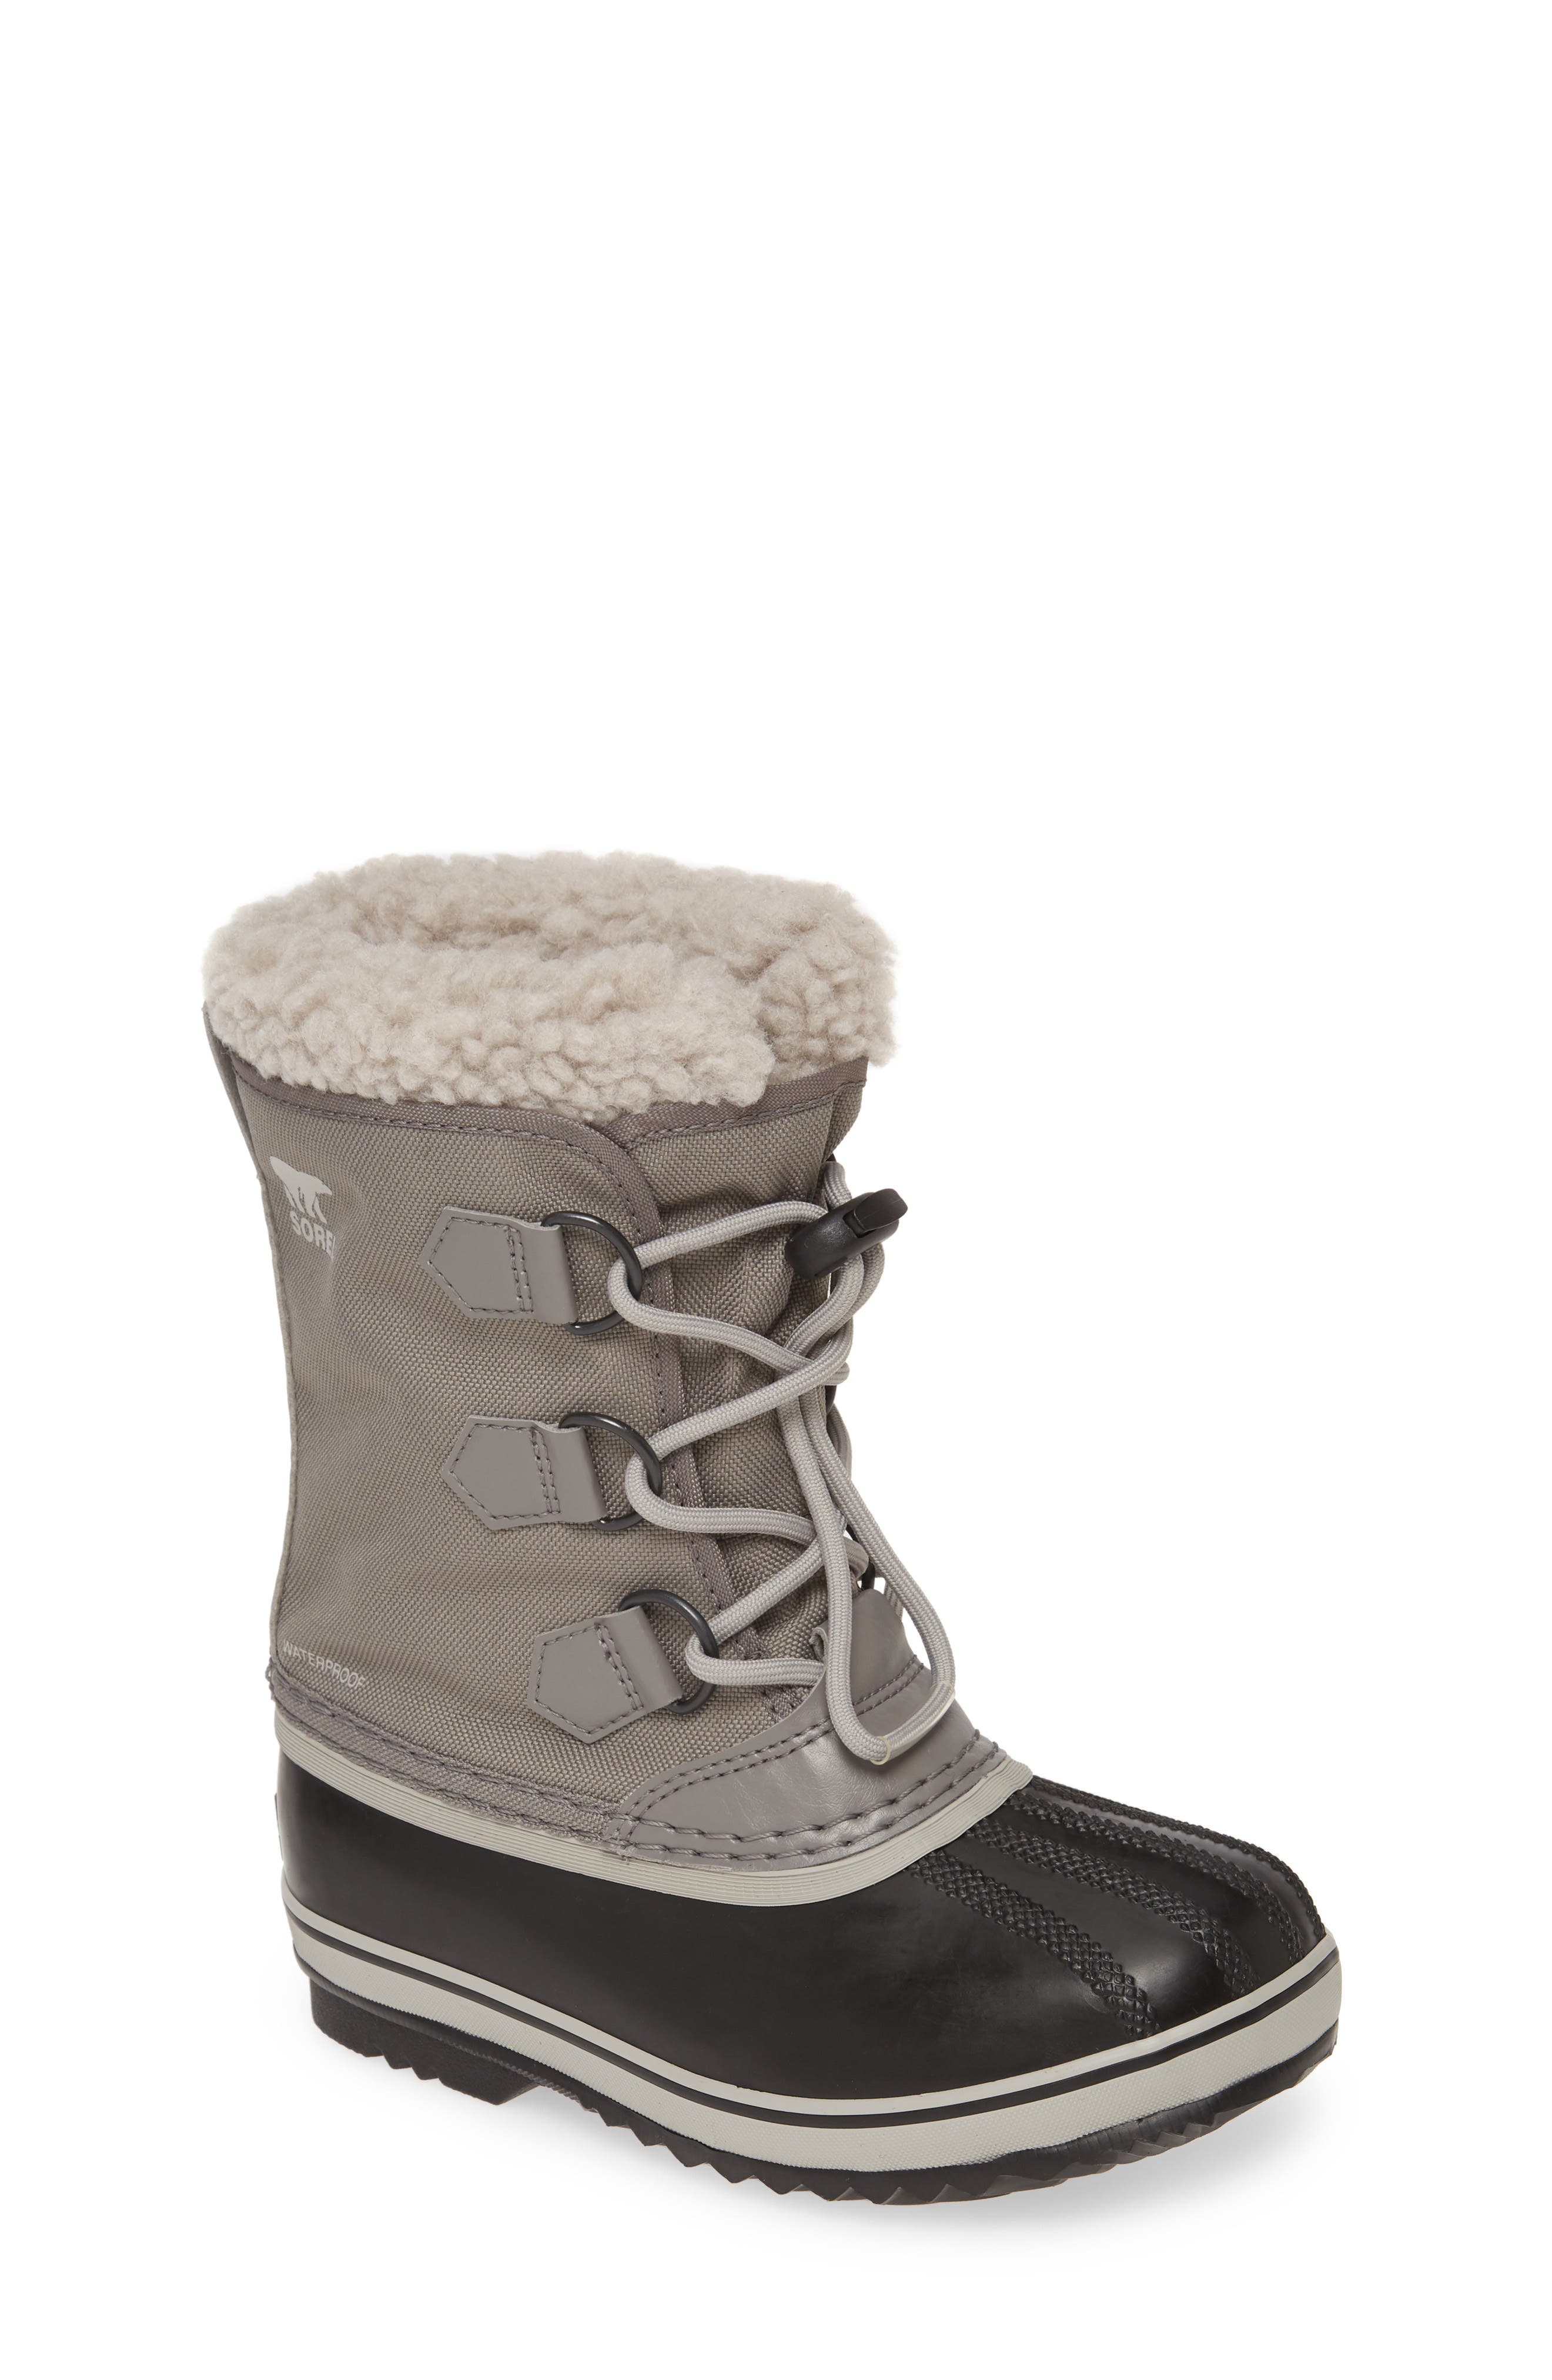 SOREL Yoot Pac Waterproof Snow Boot